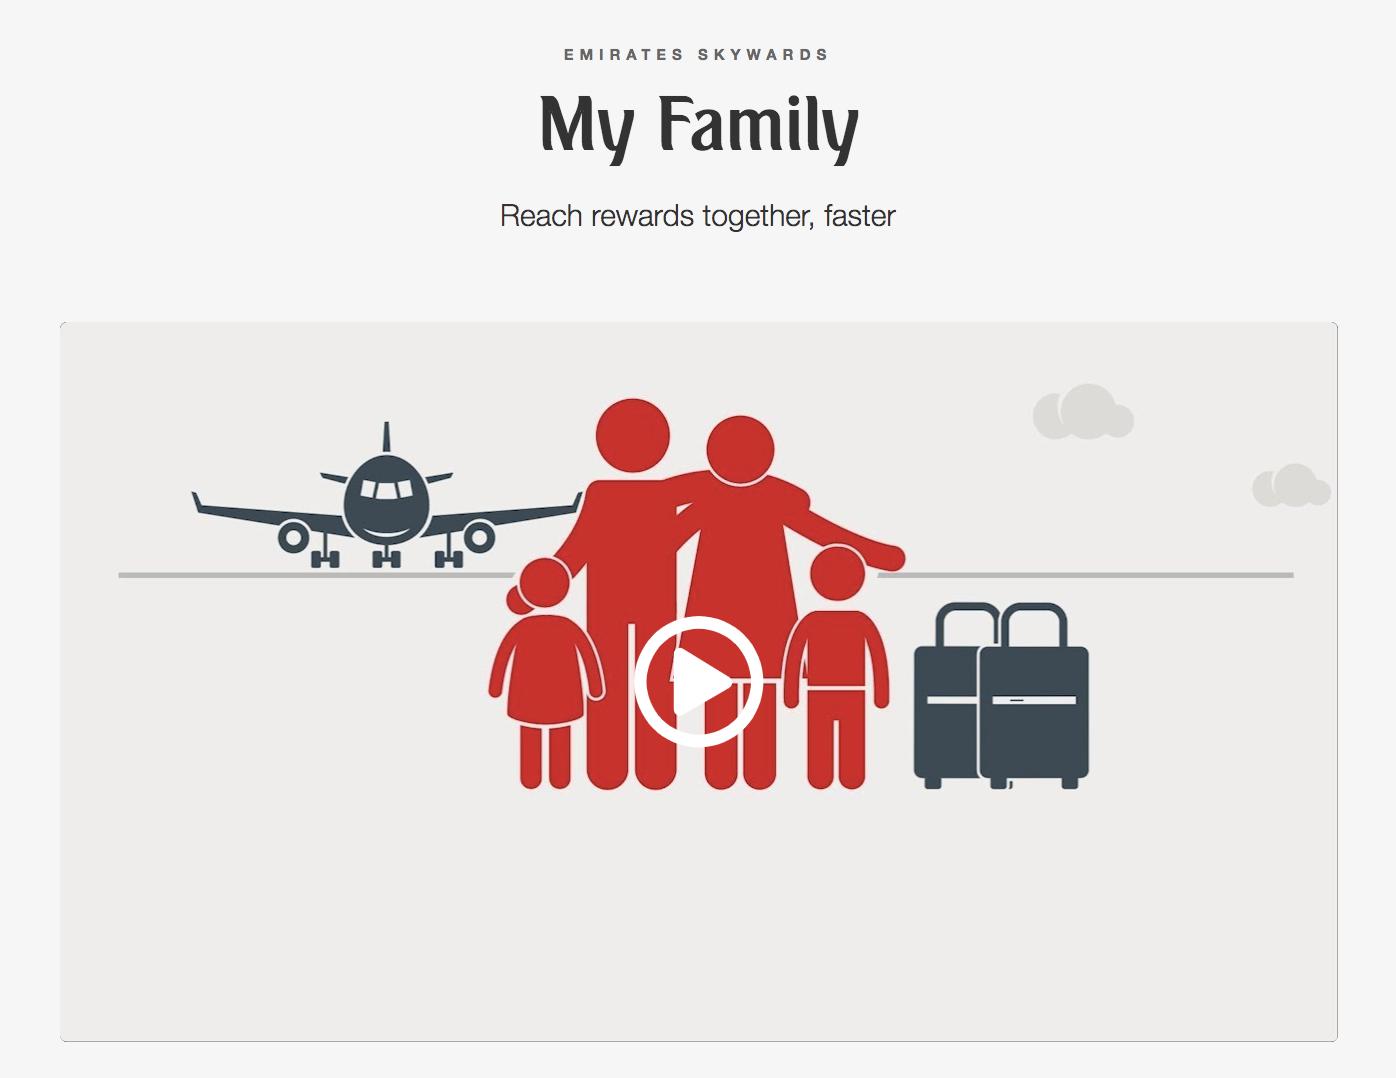 My family program